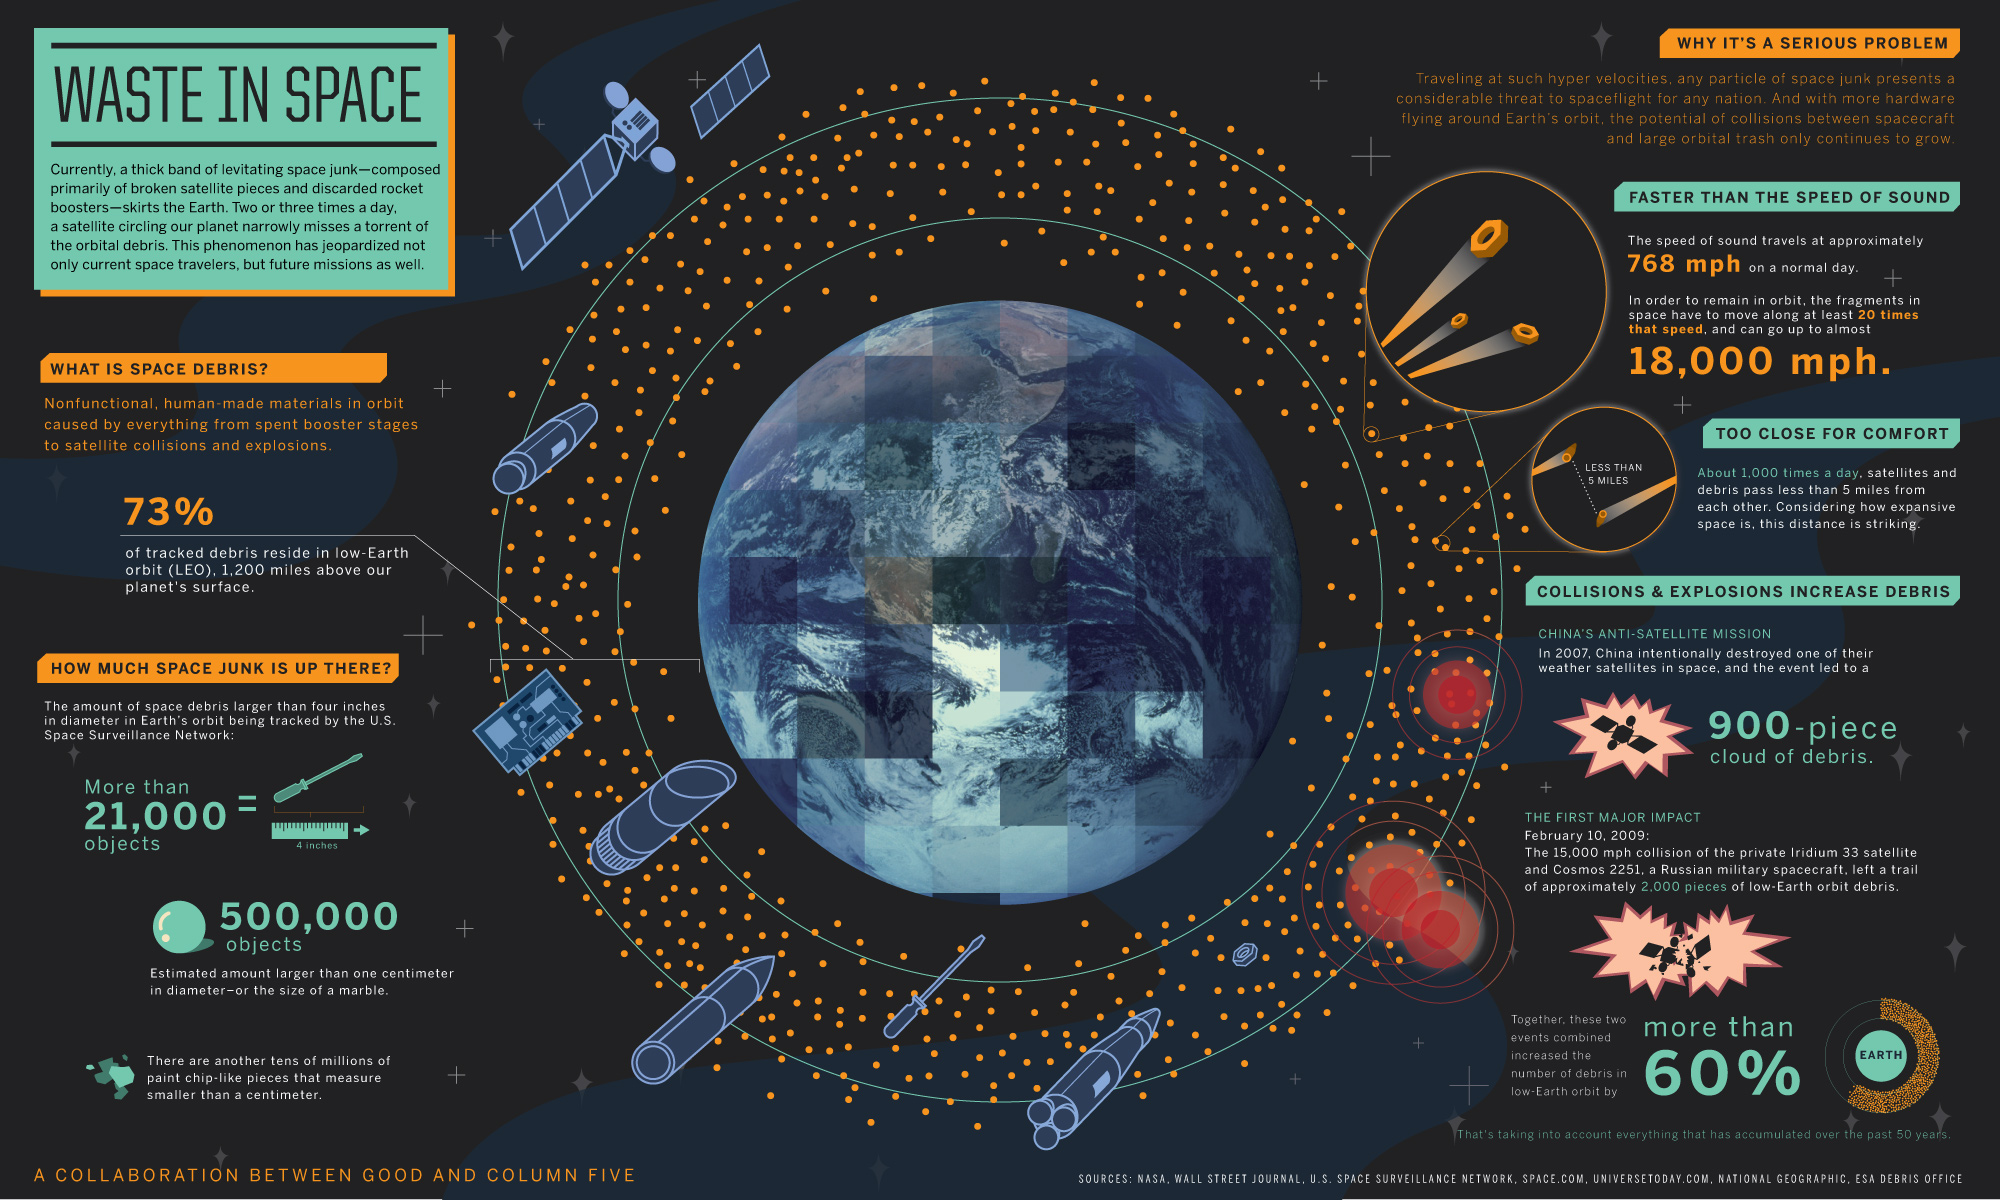 Welcome Home, Tiangong-1: China's Wayward Space Lab Returns